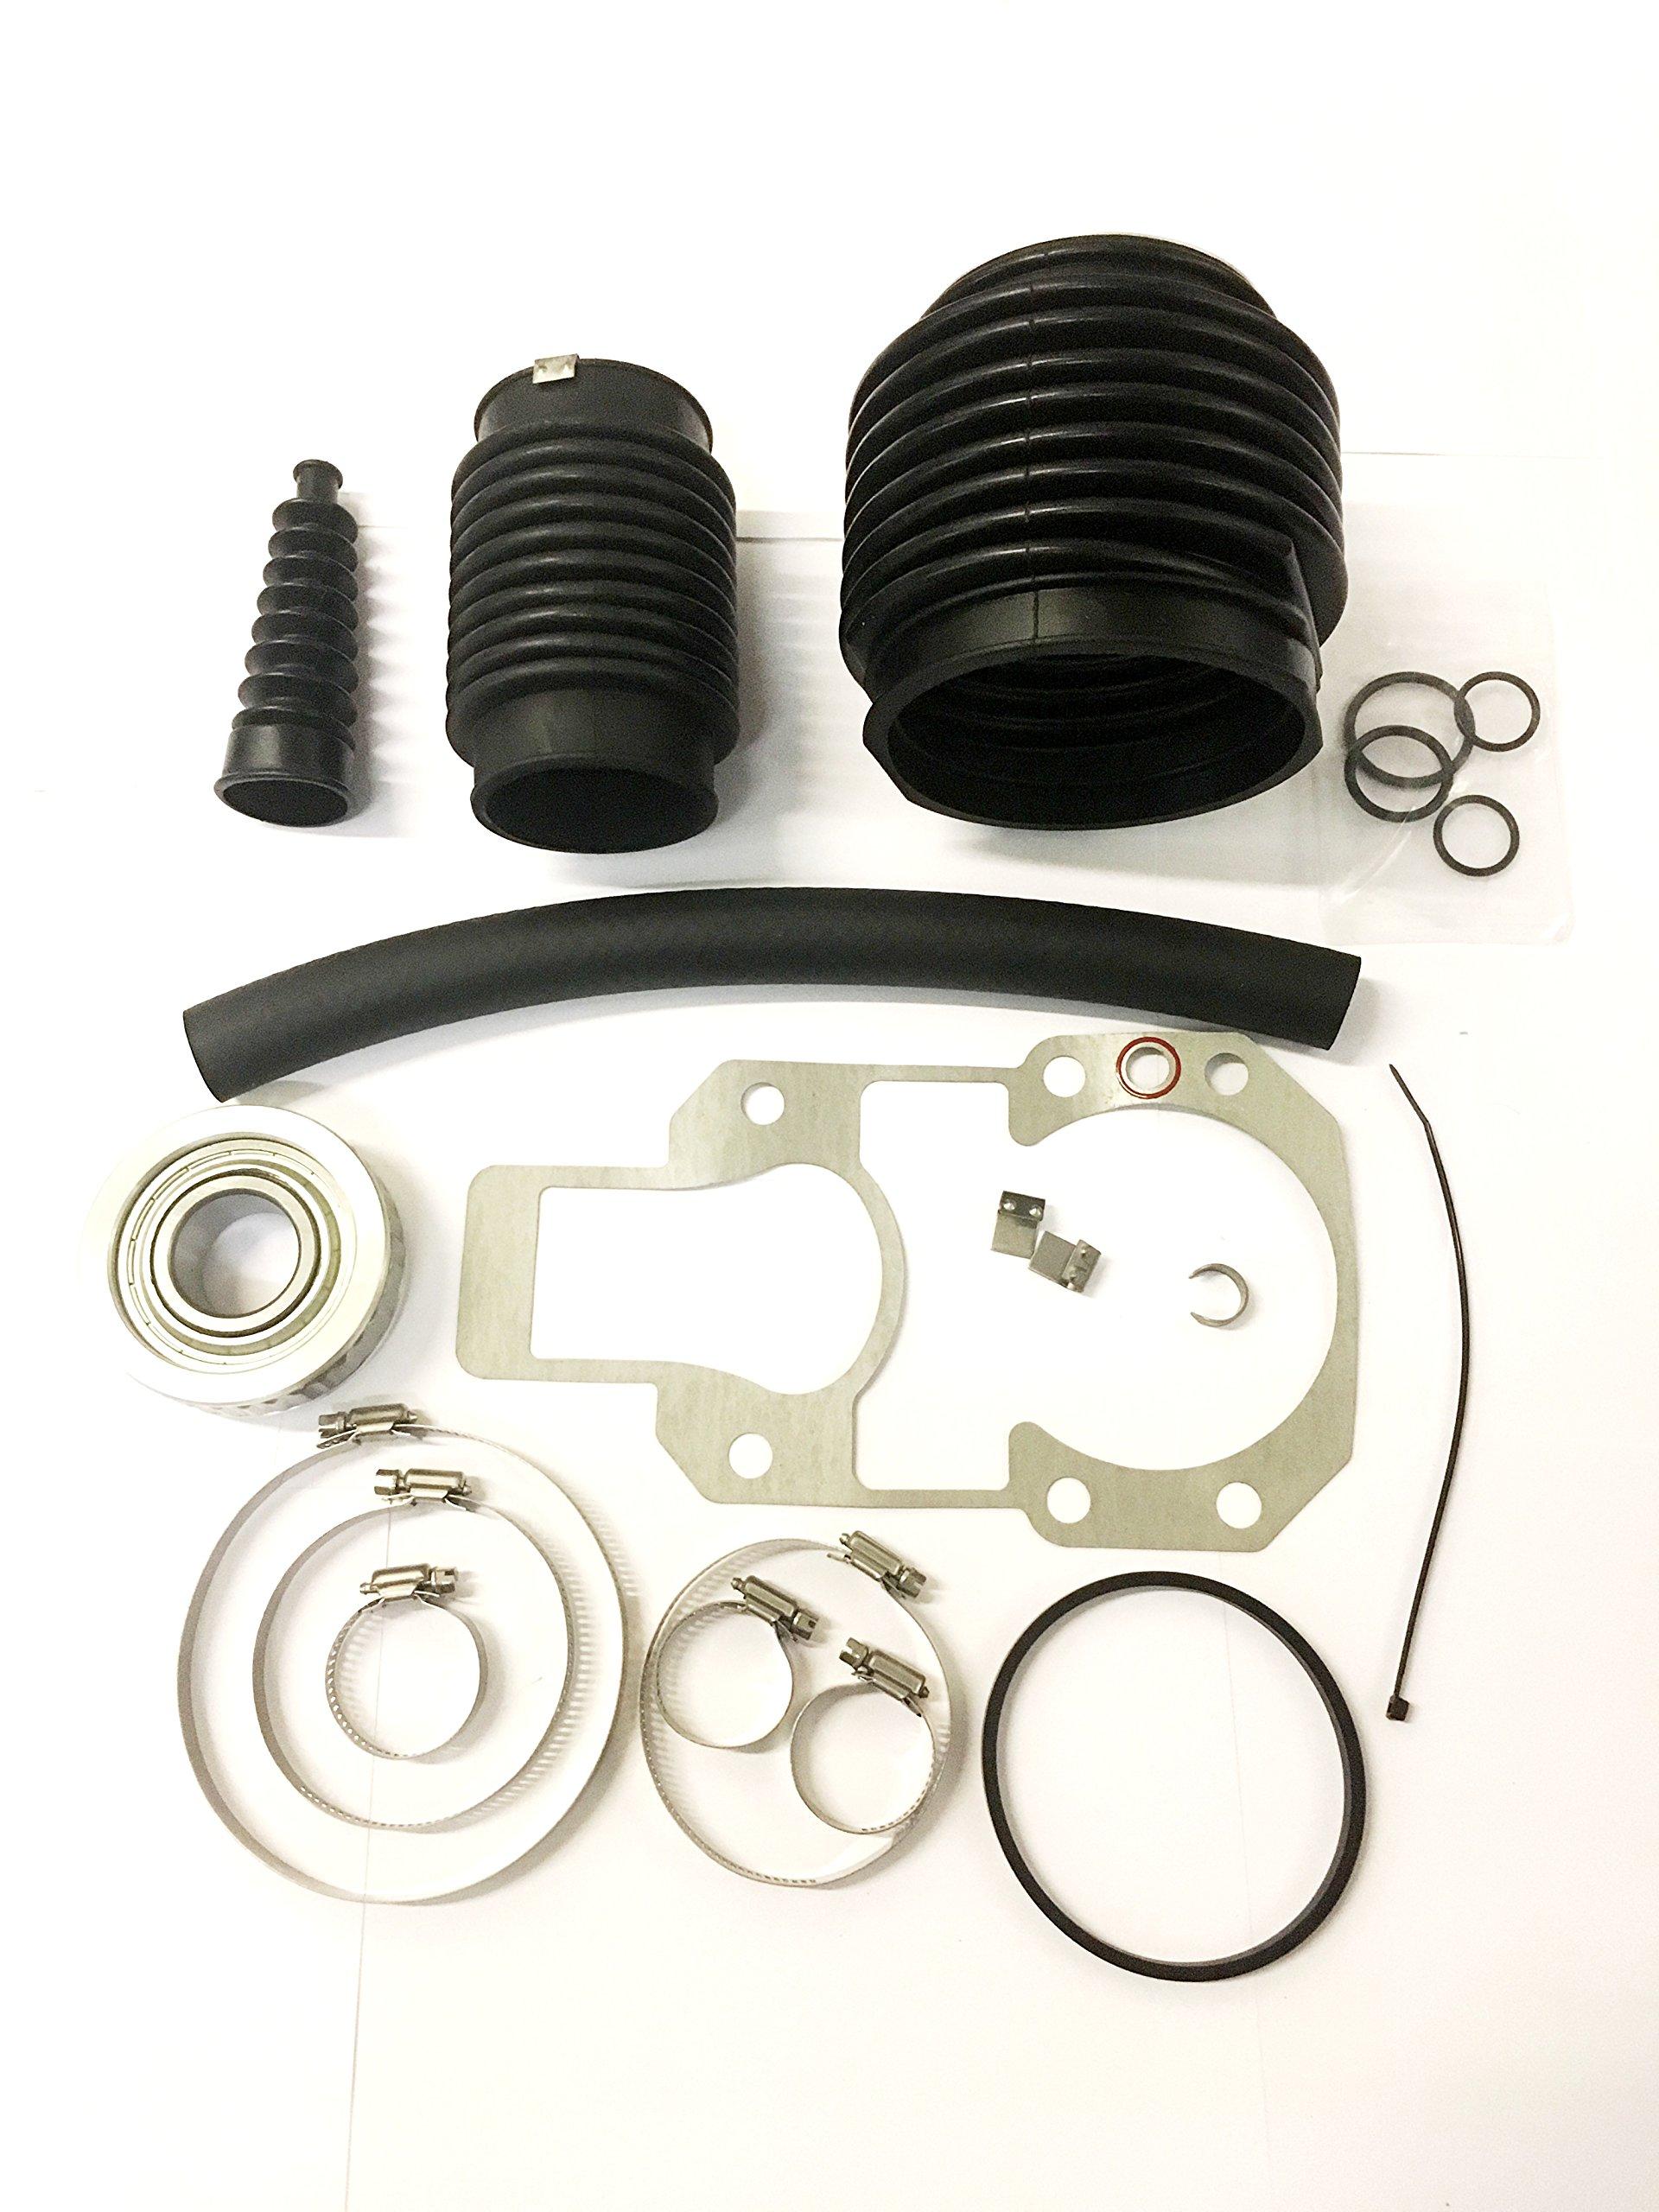 Automotive Authority MerCruiser Alpha one 1 Gen 2 two Transom Bellows Repair Reseal Kit 30-803099T1